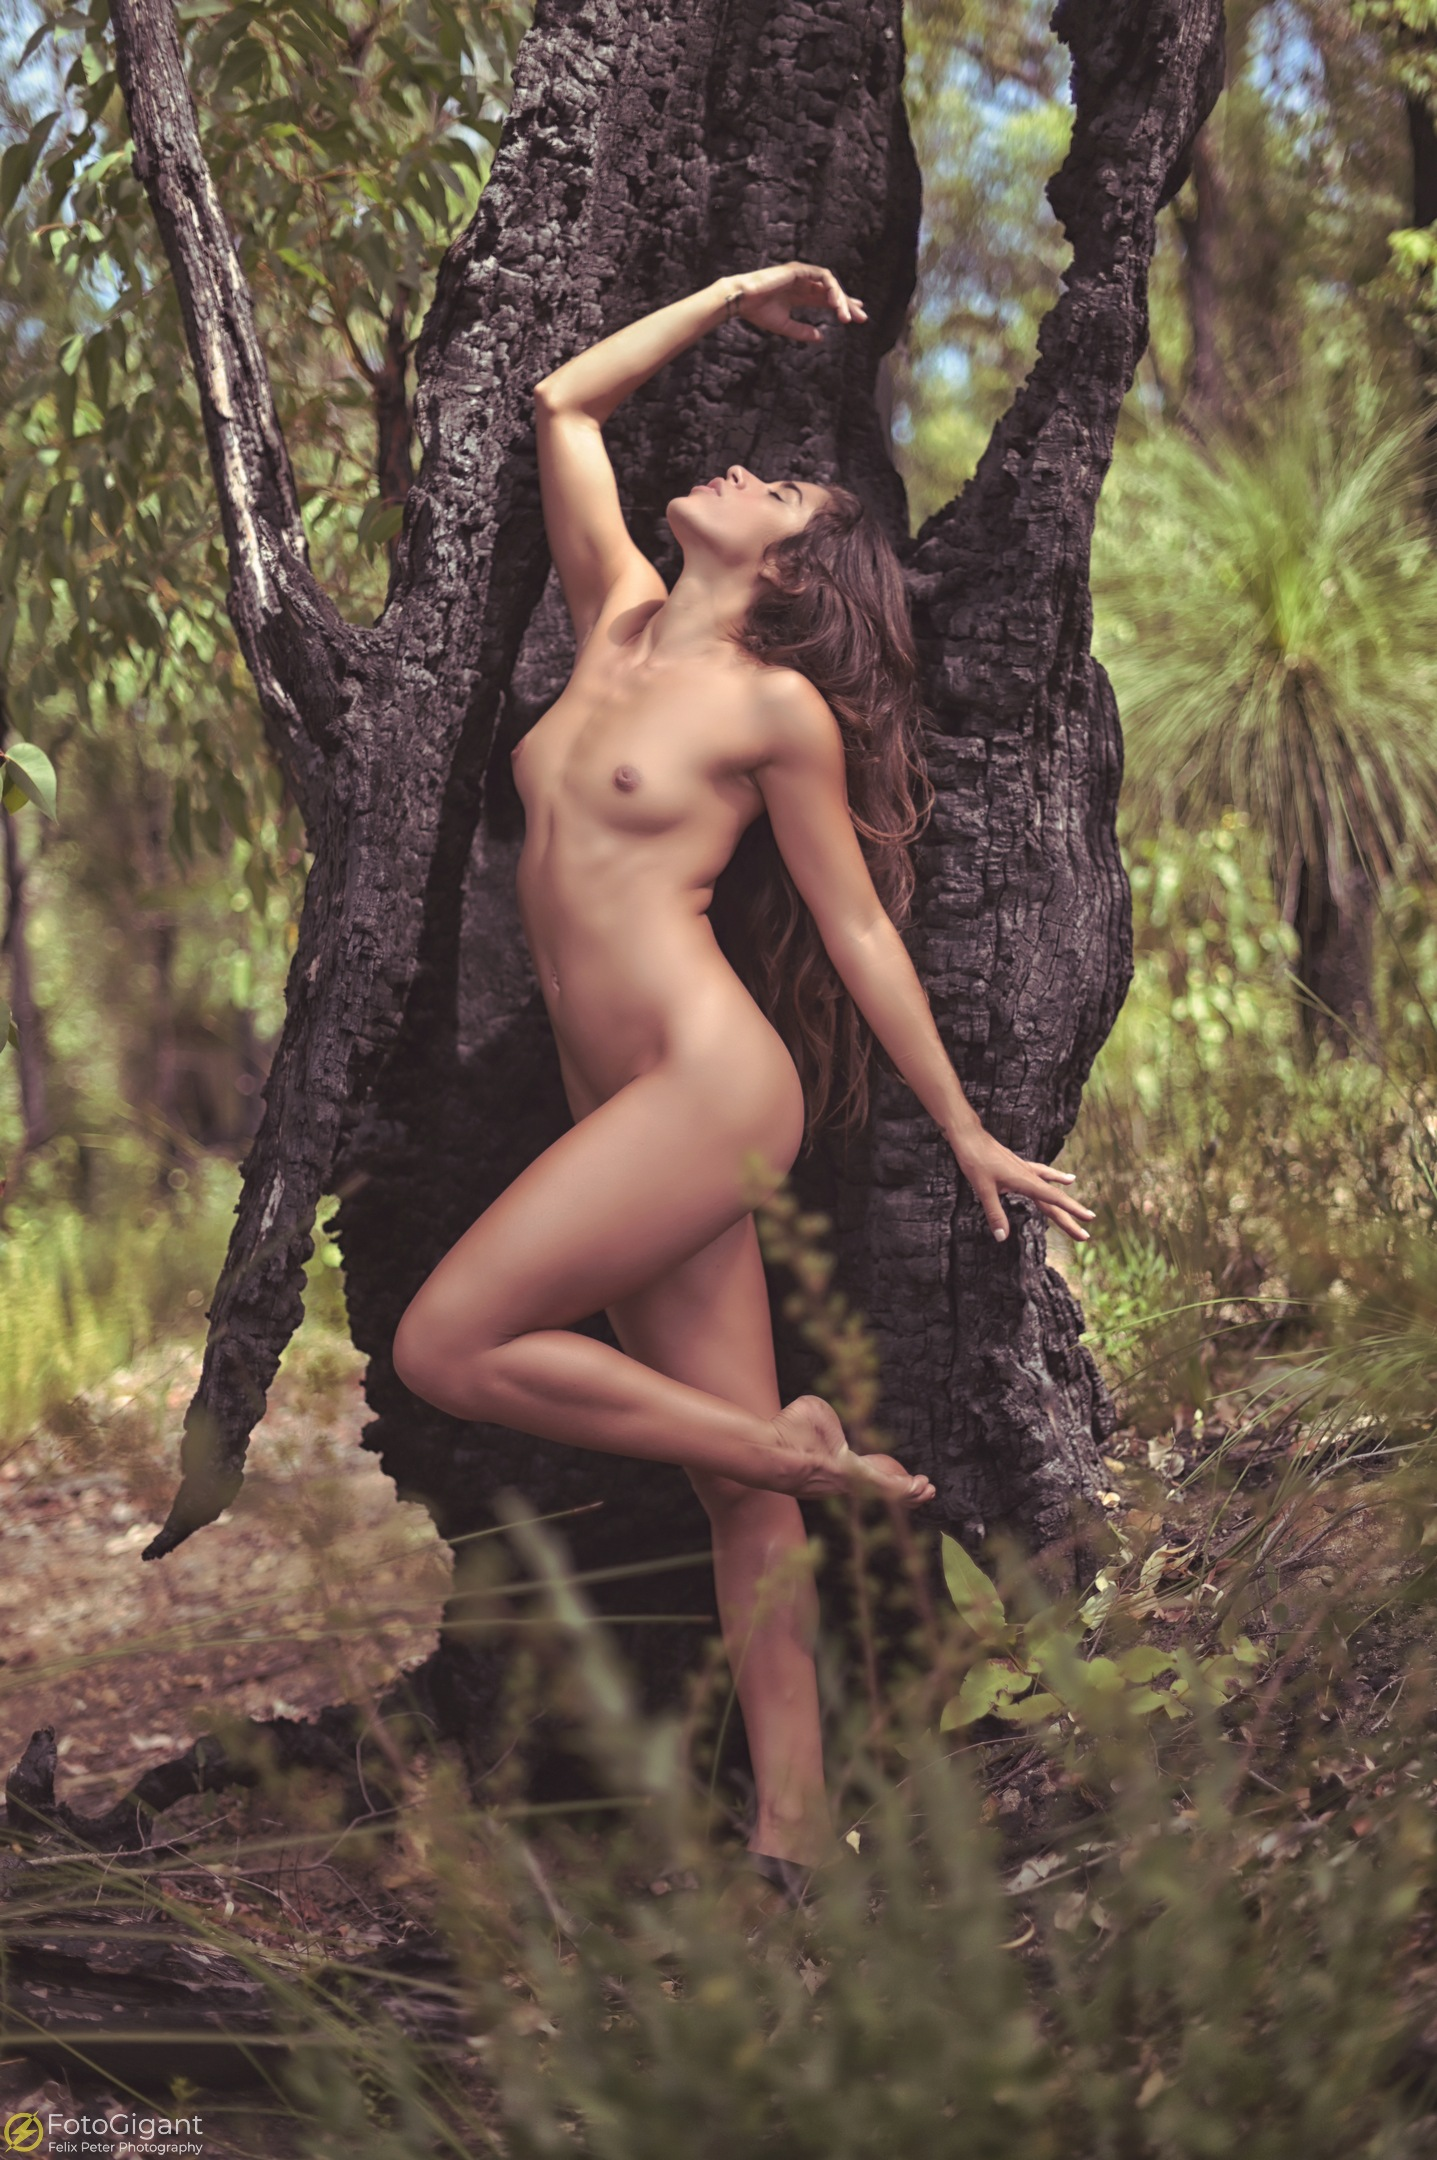 NudeArt_Aktfotografie_Eva-Luna_34.jpg